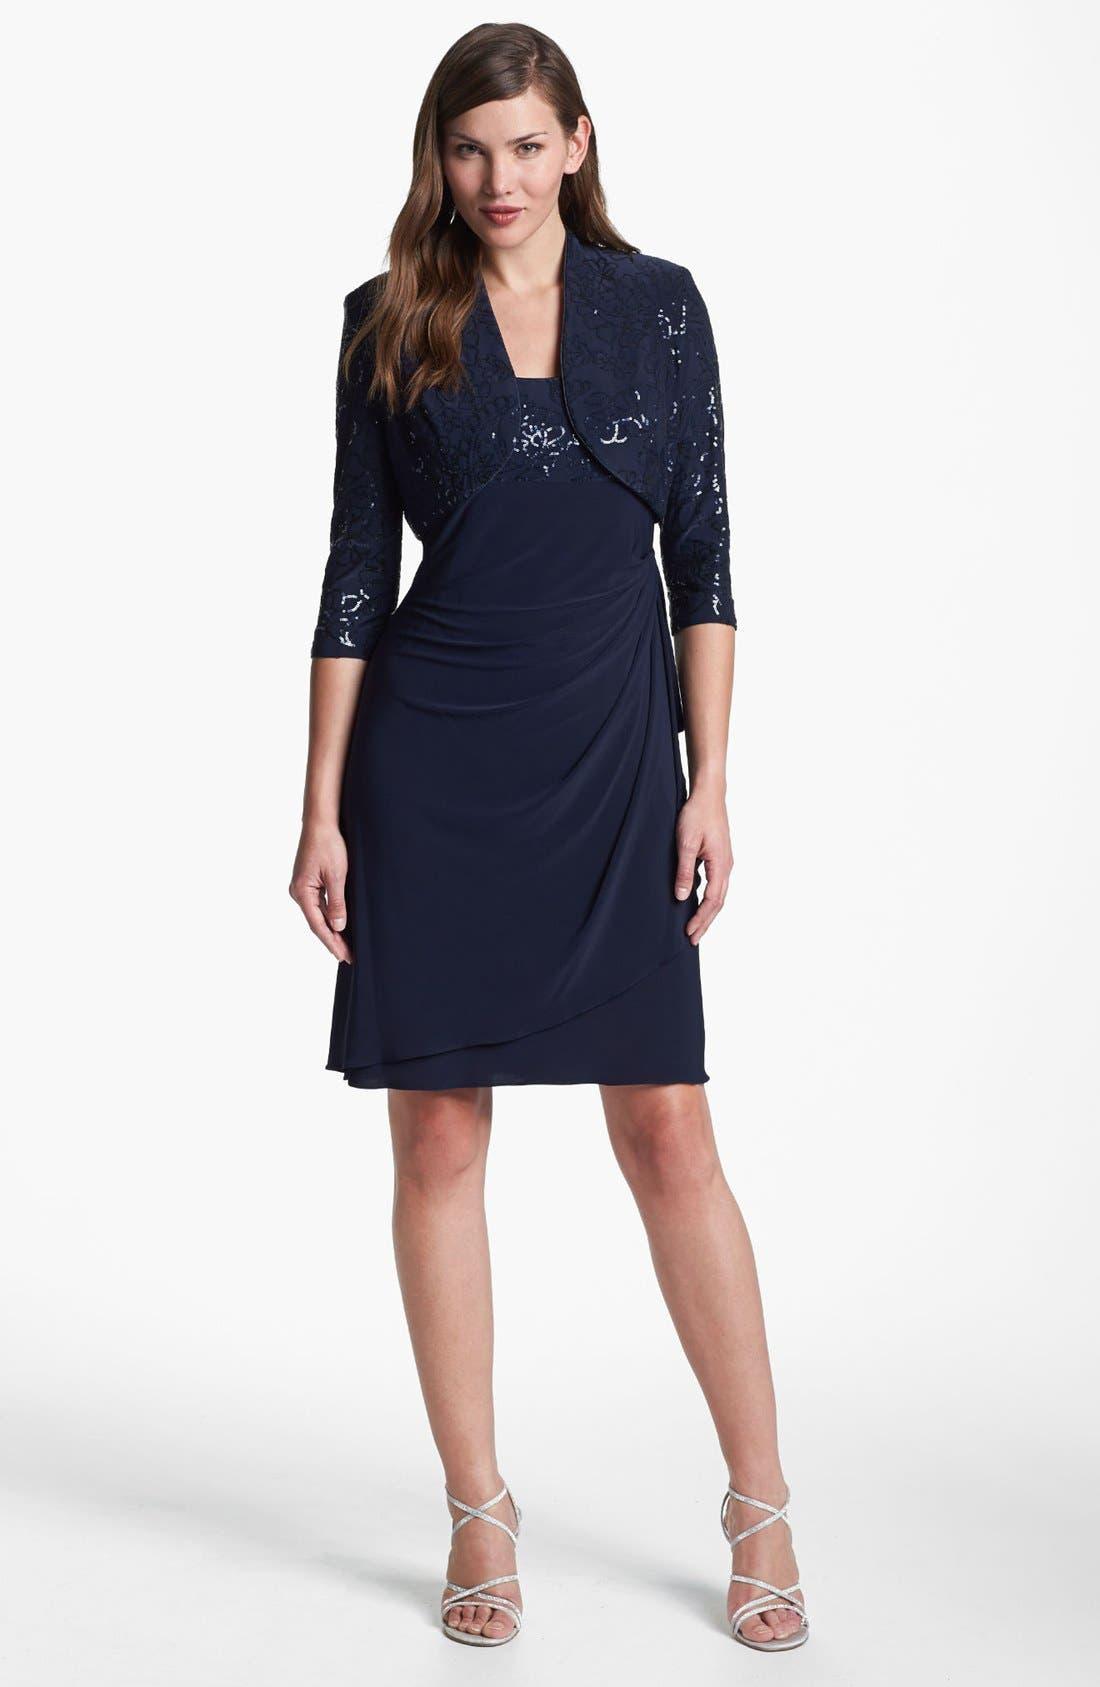 Main Image - Alex Evenings Sequin Trim Dress & Bolero (Petite)